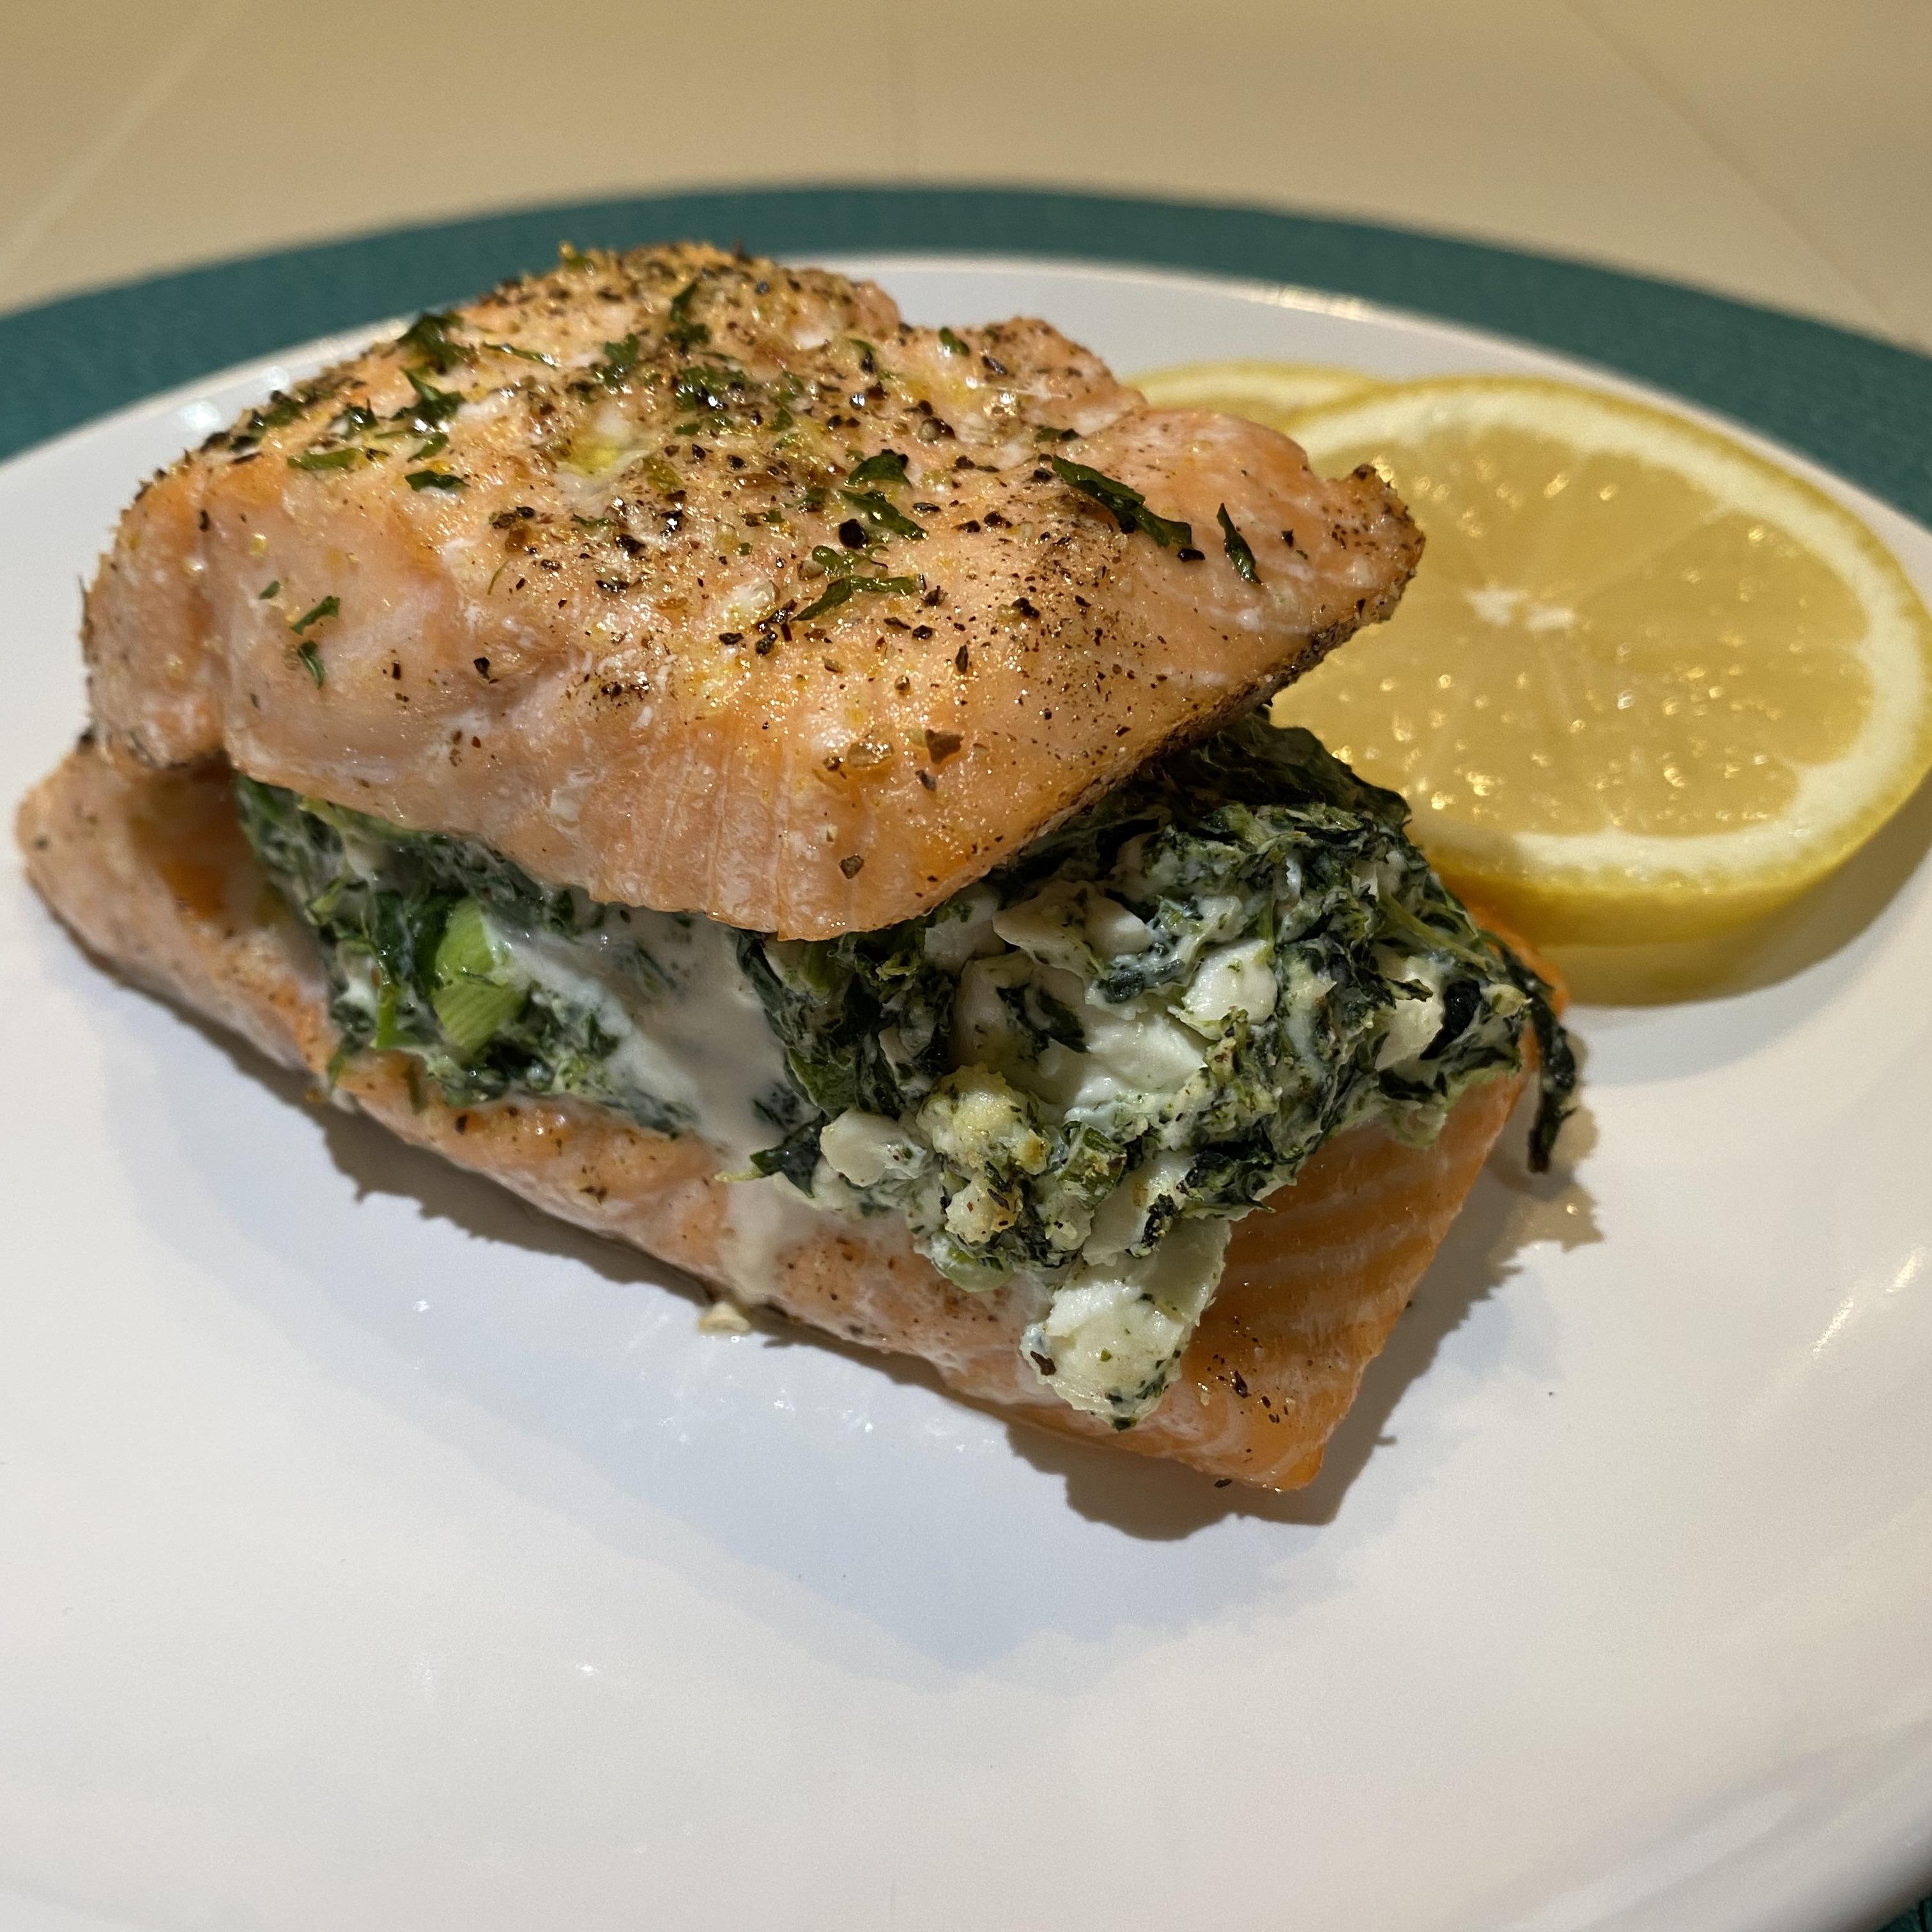 Feta-Spinach Stuffed Salmon